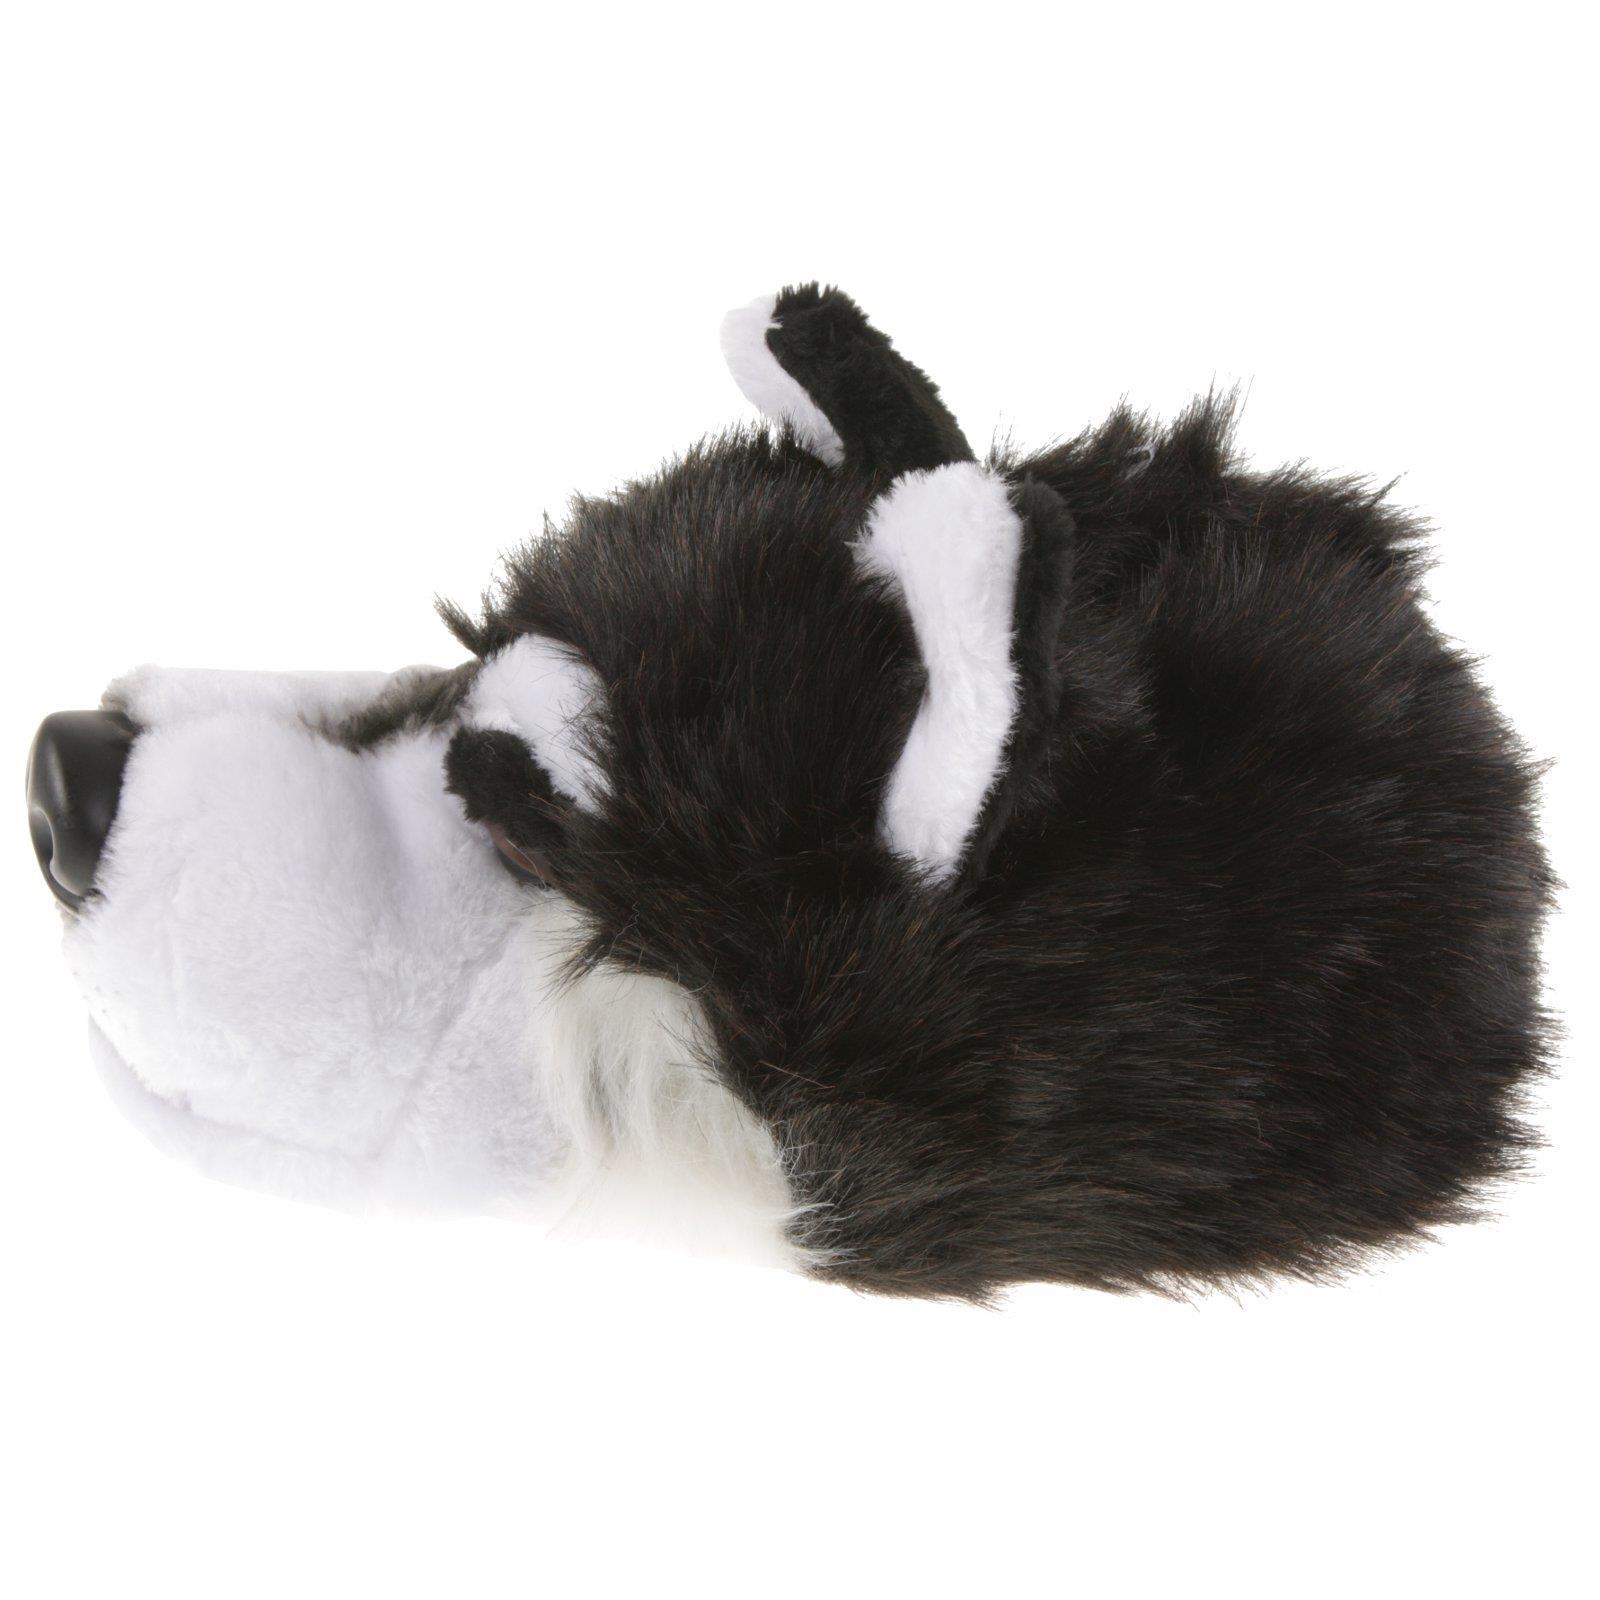 Husky Husky Husky Loup Animal Chaussons Pantoufle Chaussons Peluche Chien Chaussures Noir 36-48 081f9b